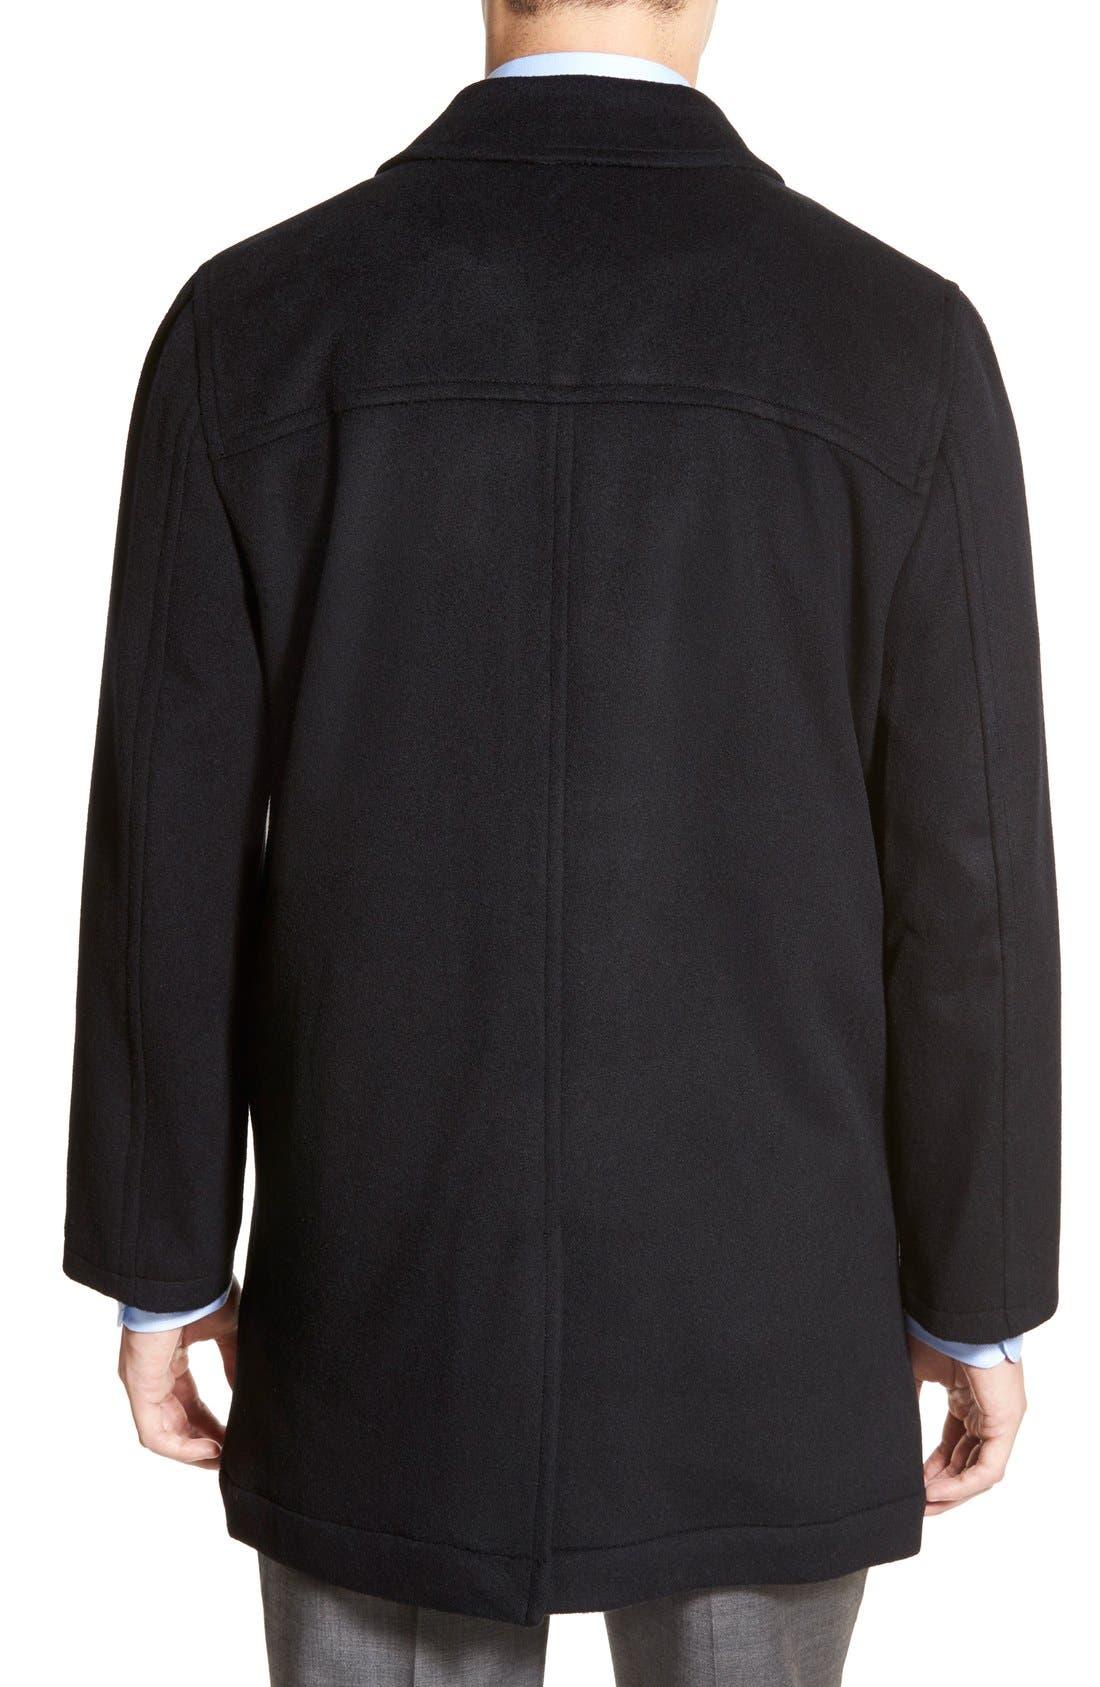 Douglas Modern Fit Wool & Cashmere Overcoat,                             Alternate thumbnail 4, color,